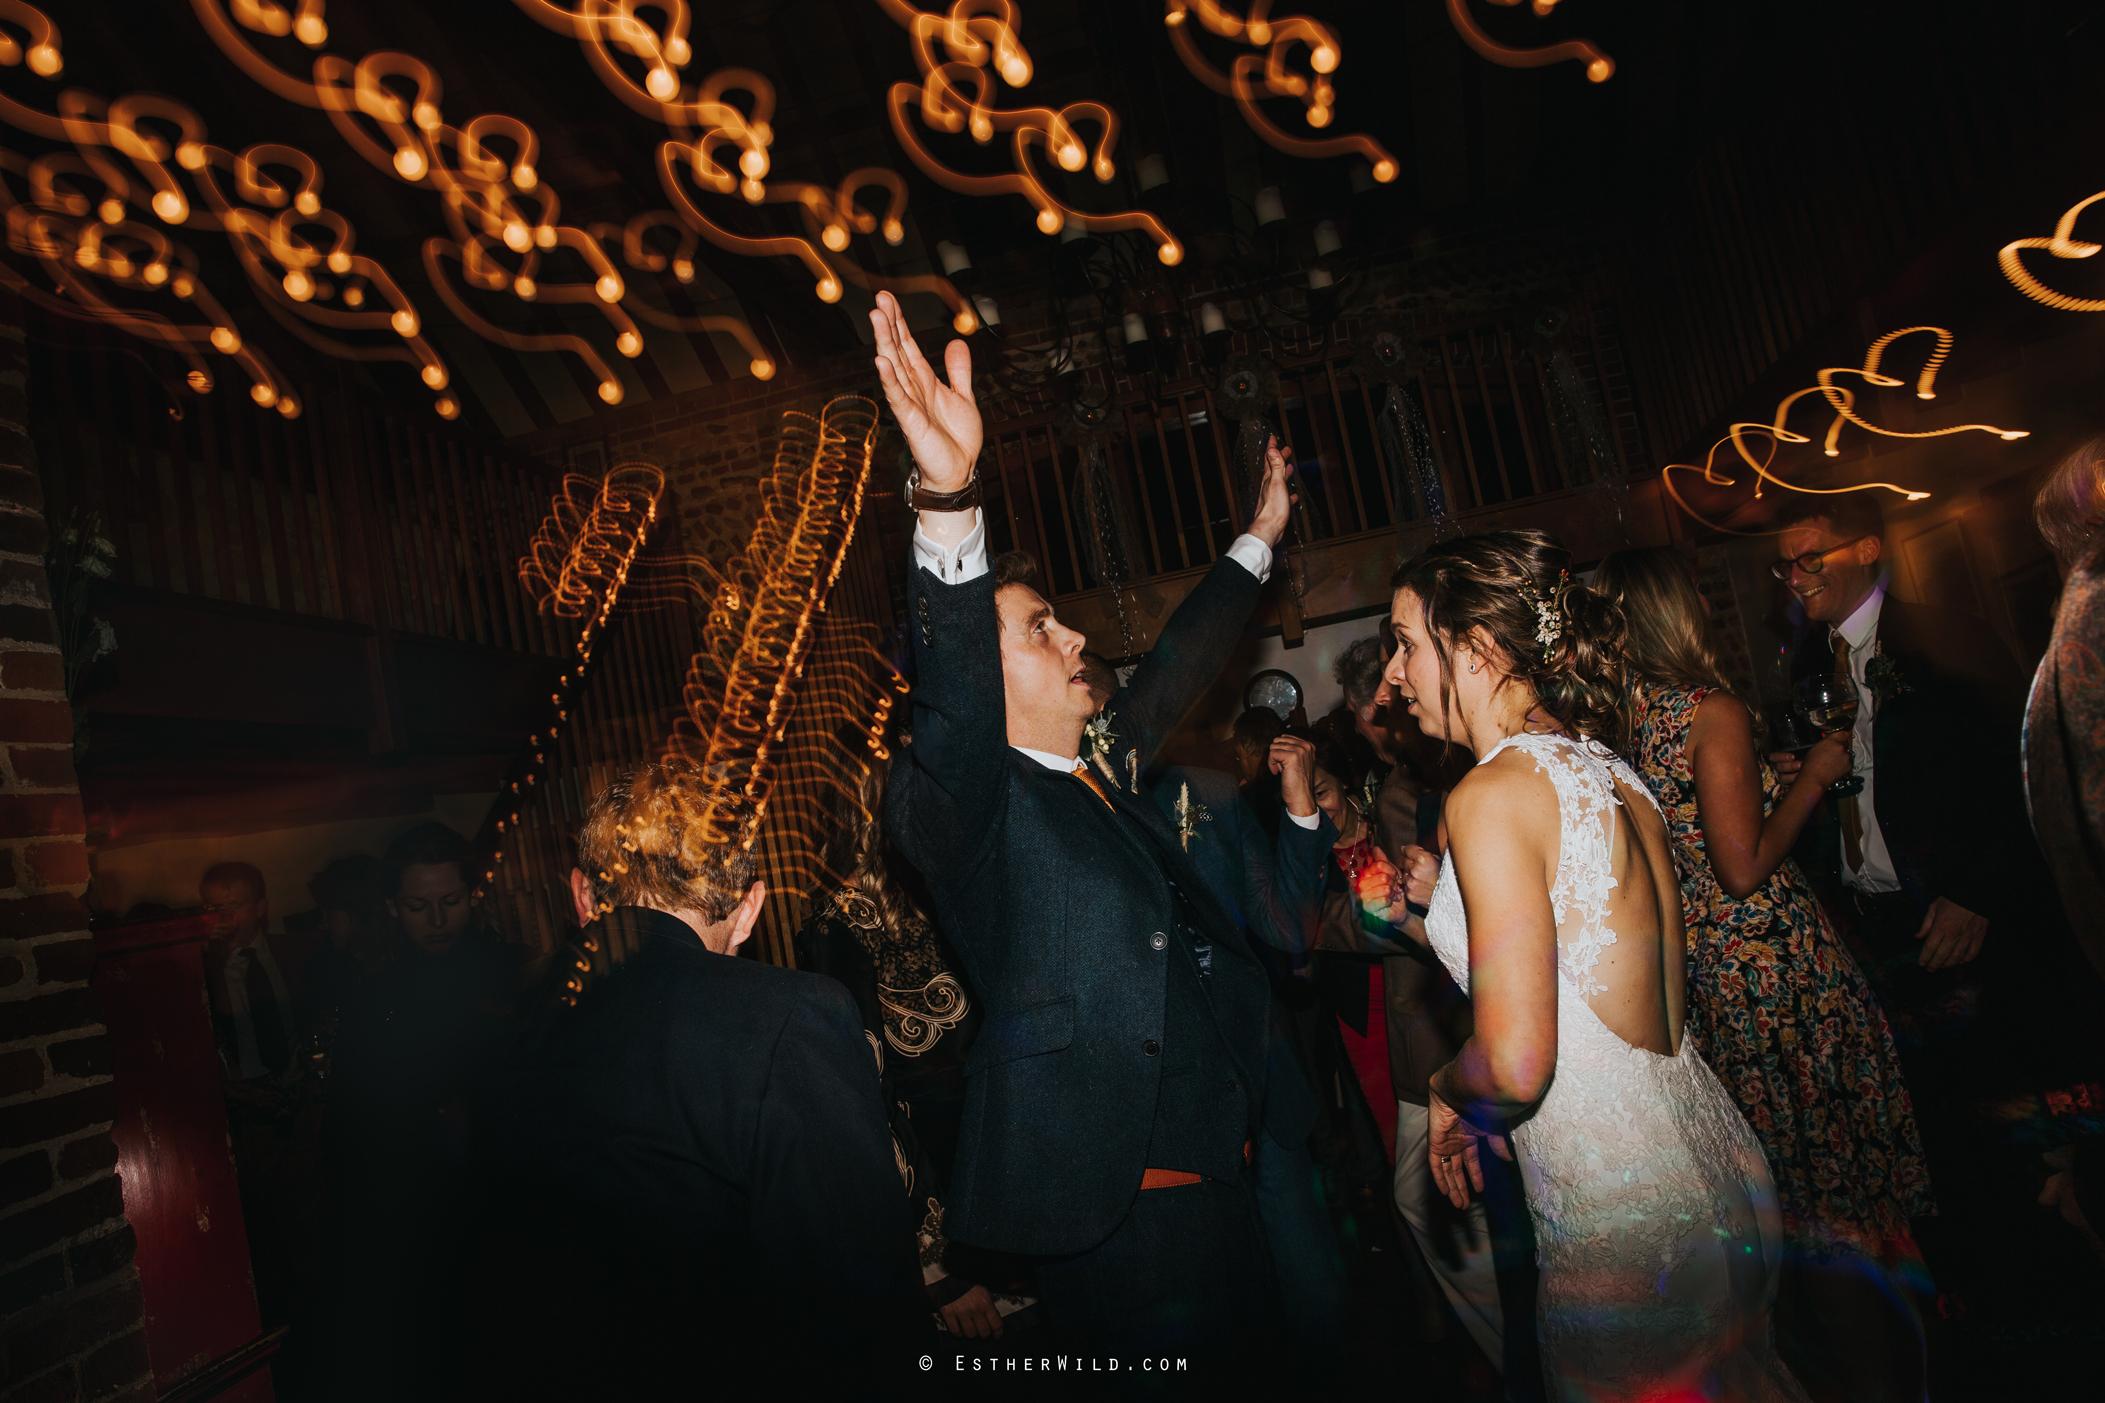 1117_Chaucer_Barn_Wedding_Photography_Esther_Wild_Norfolk_Photographer_Z72A0969.jpg